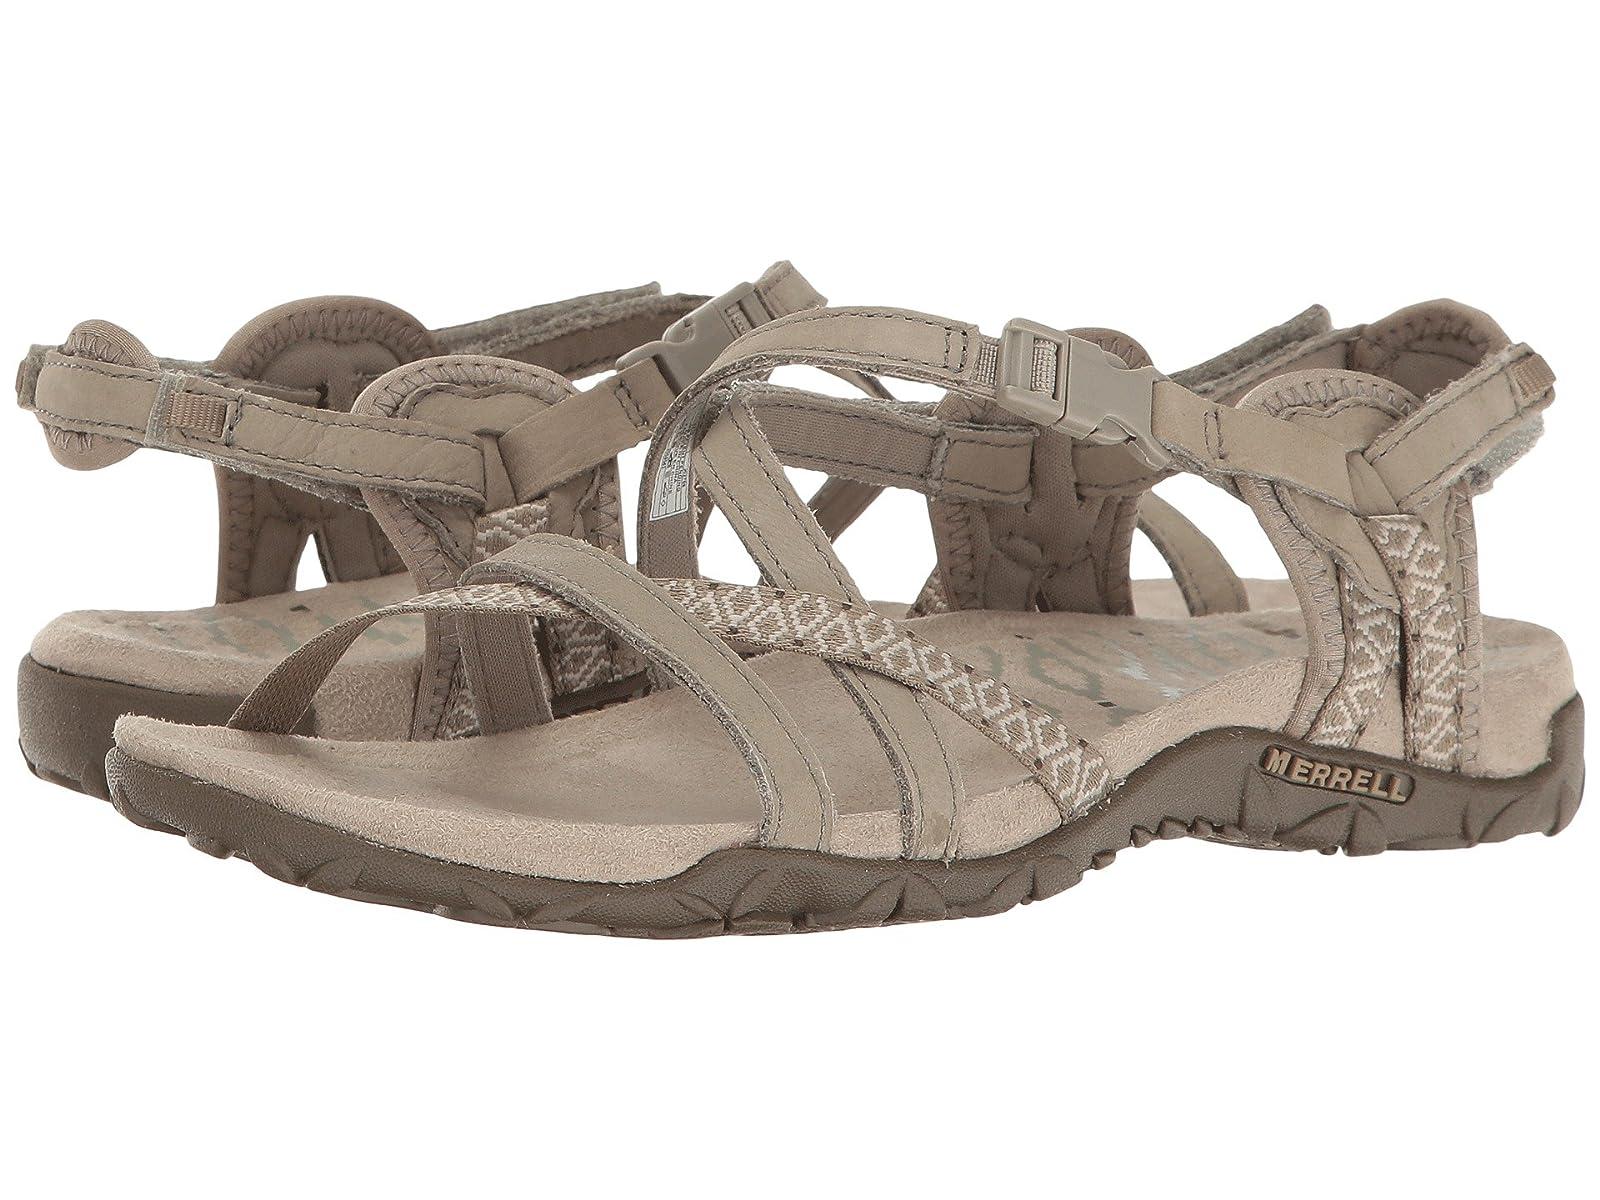 Merrell Terran Lattice IIAtmospheric grades have affordable shoes